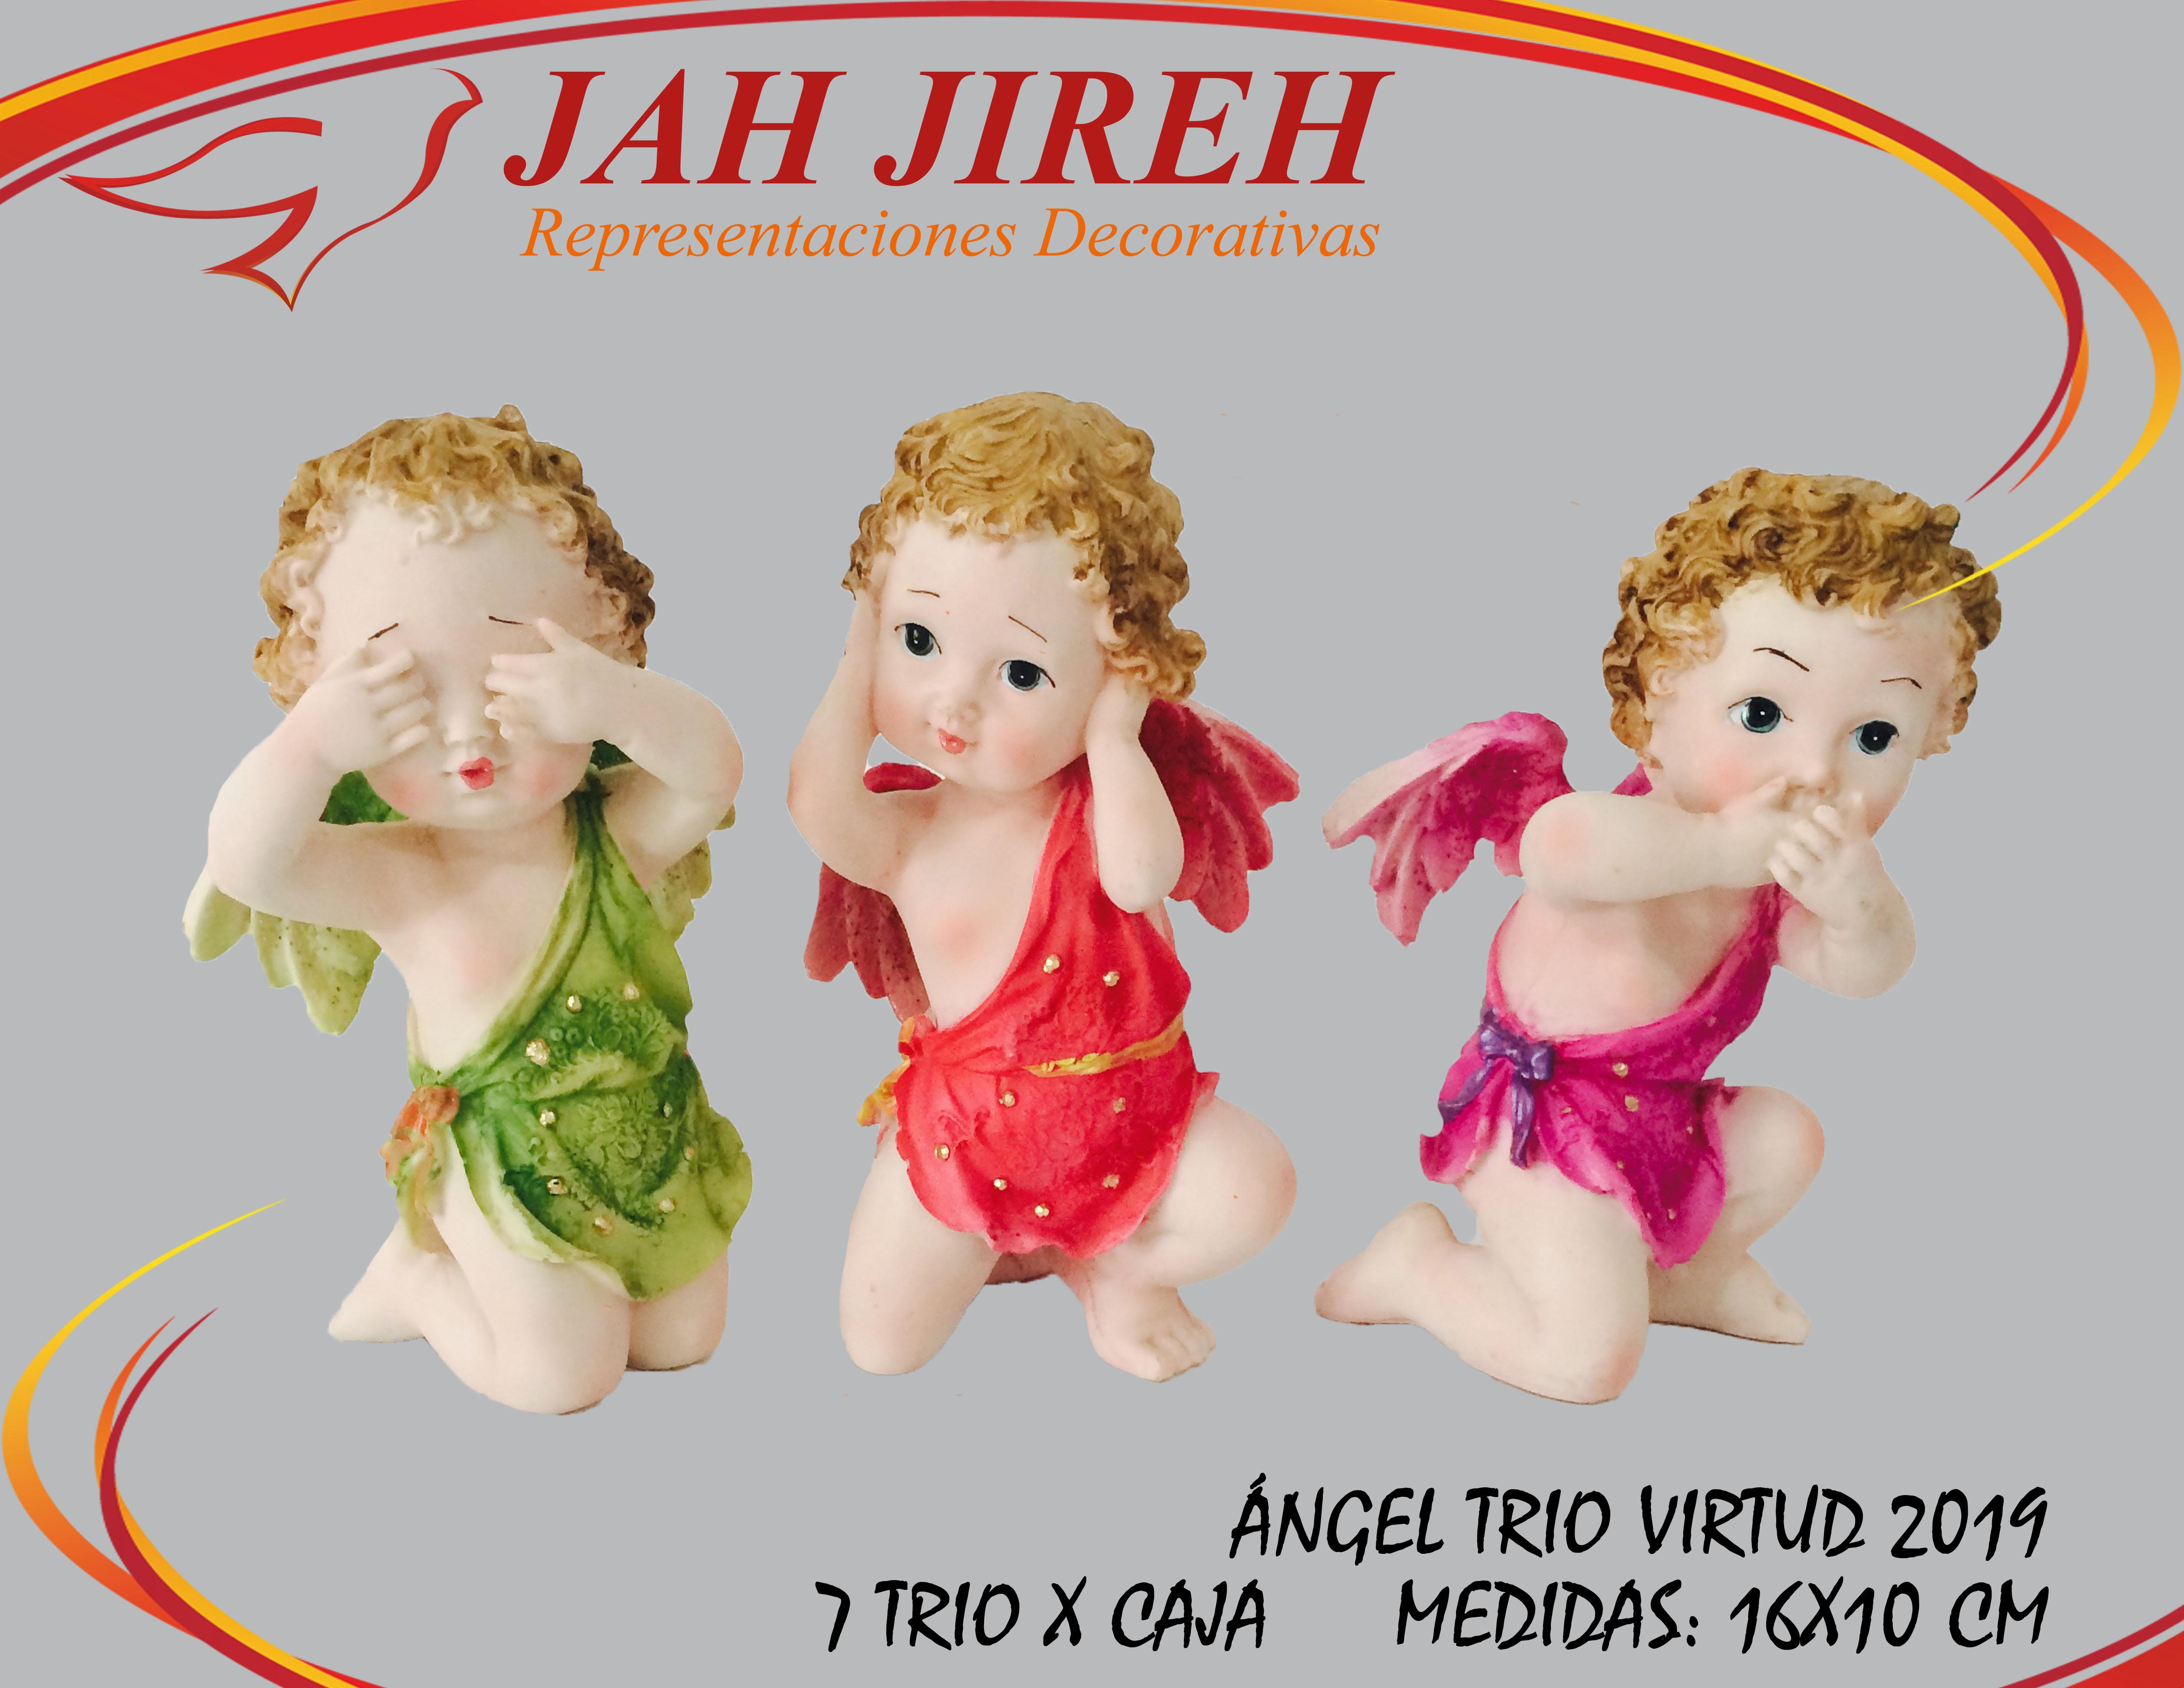 https://0201.nccdn.net/1_2/000/000/190/657/angel-trio-virtud-2019.jpg